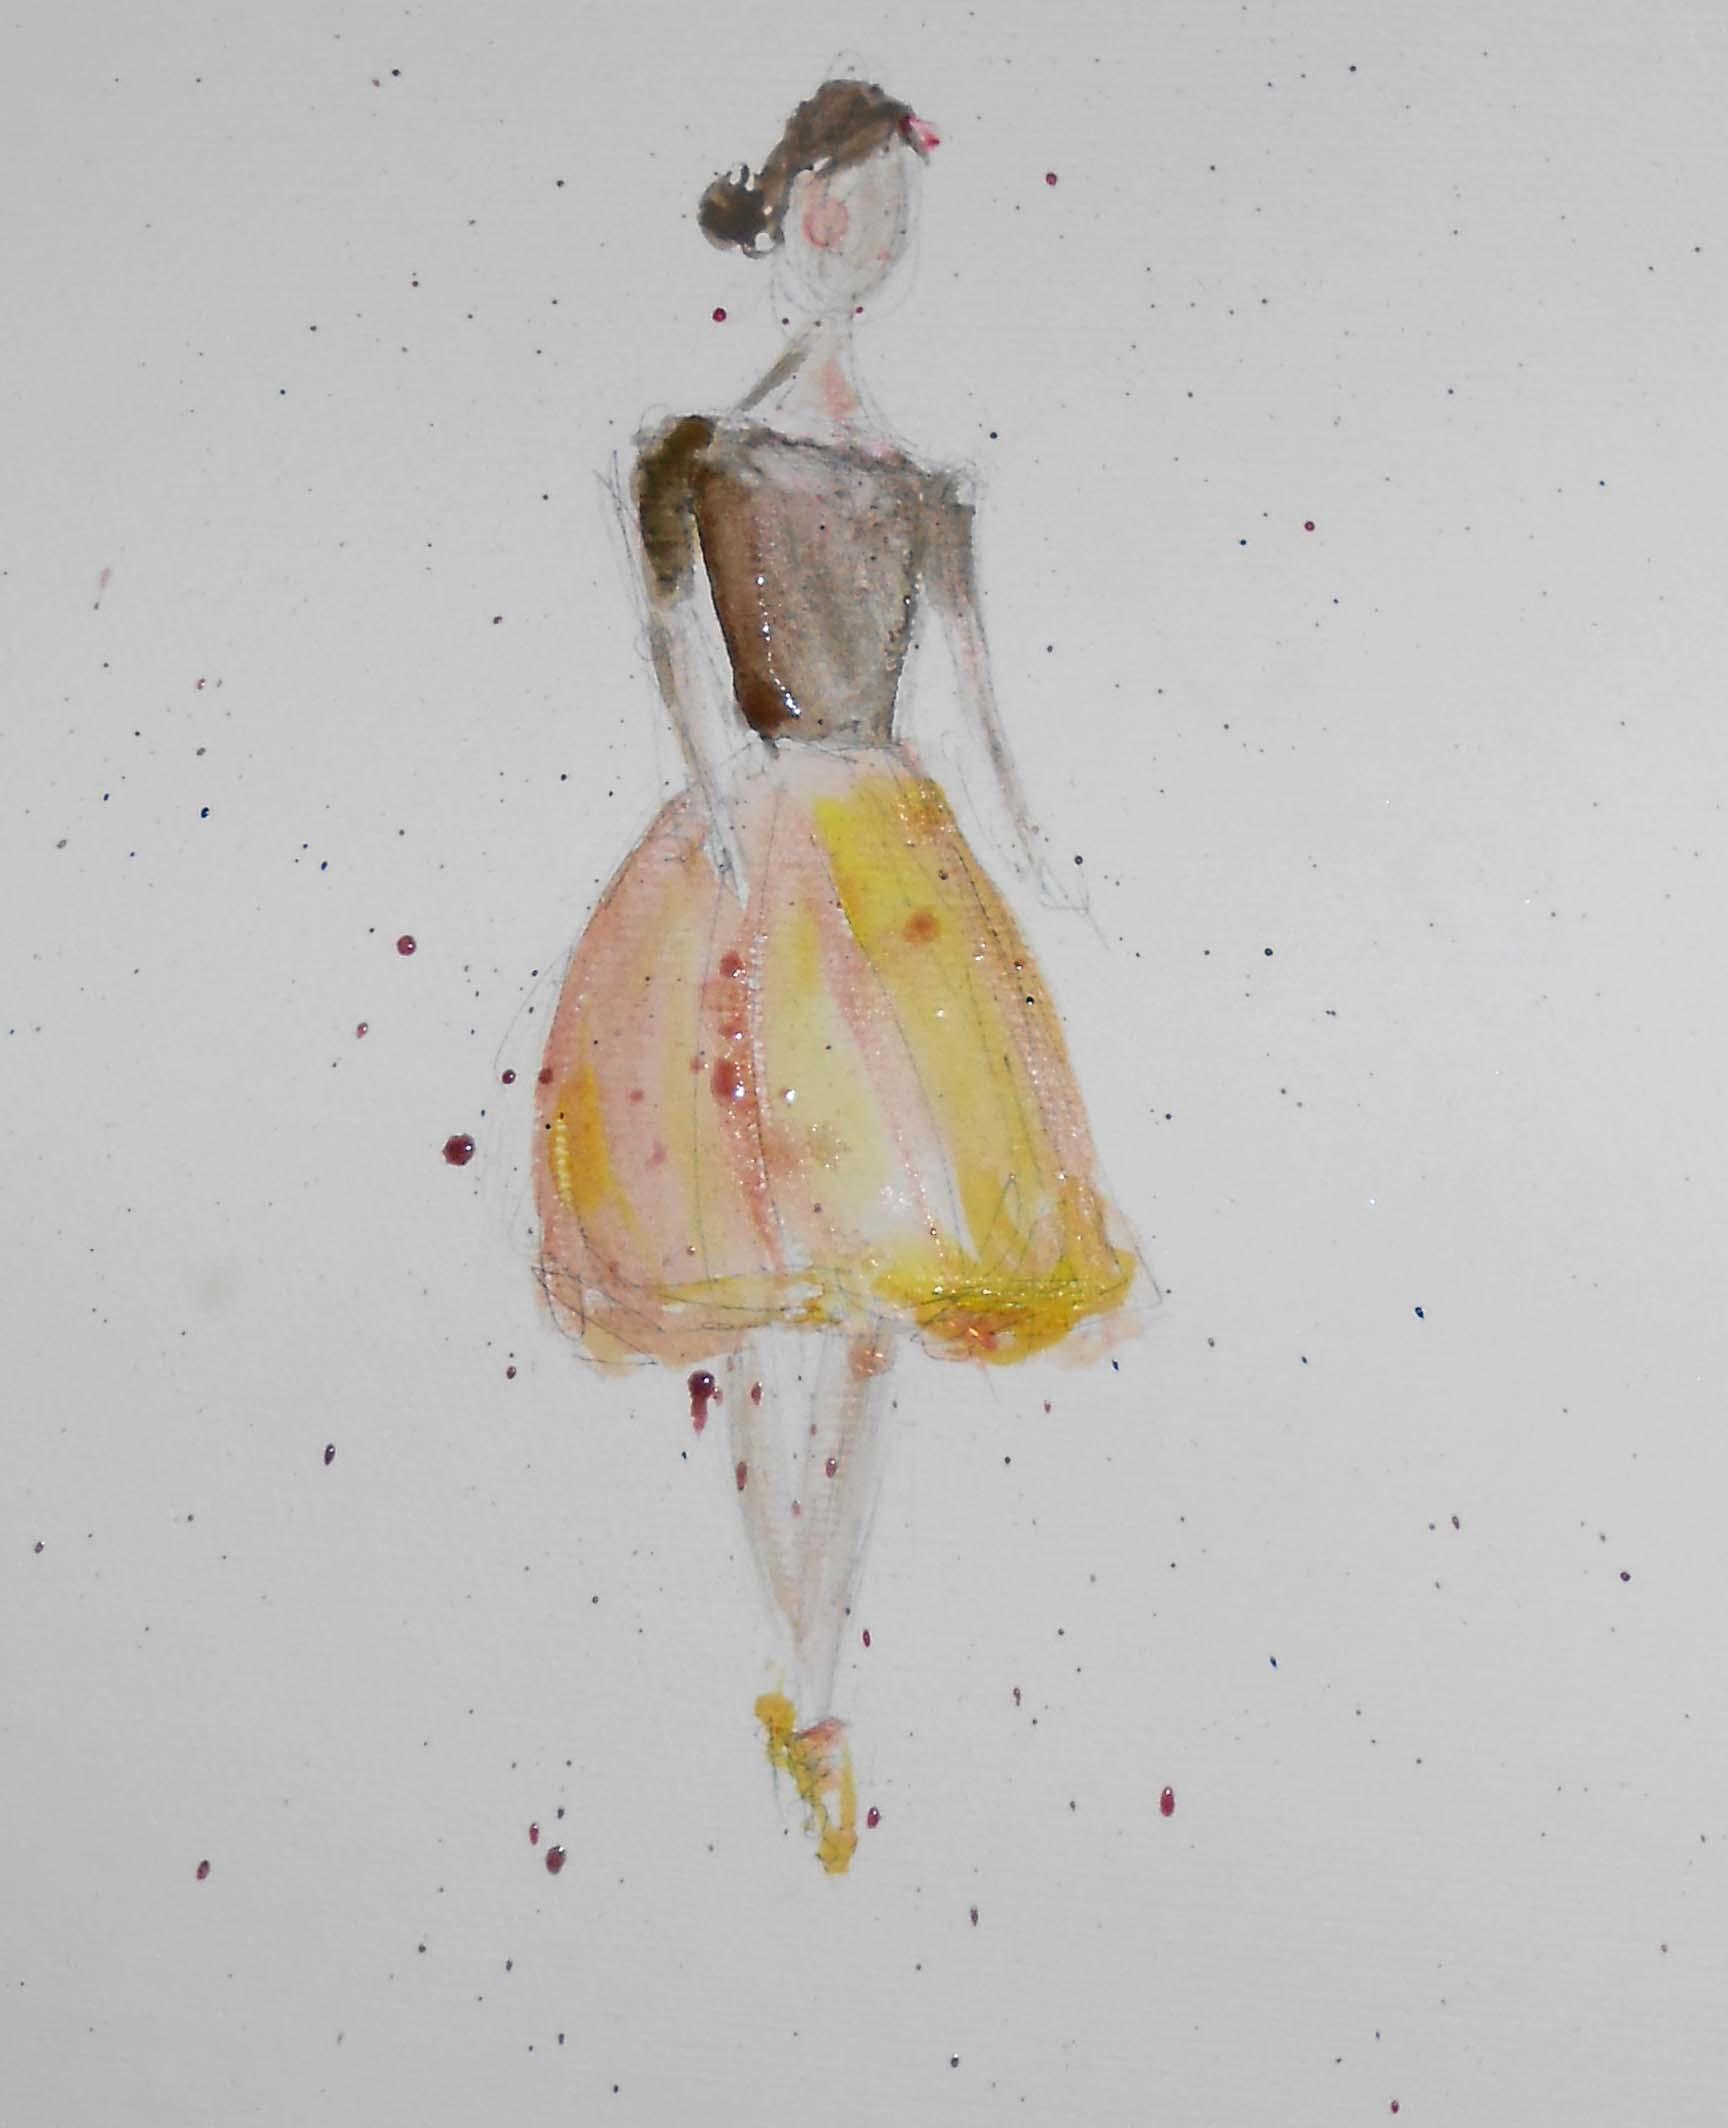 Watercolour - Silhouette & Sparkle! - image 2 - student project